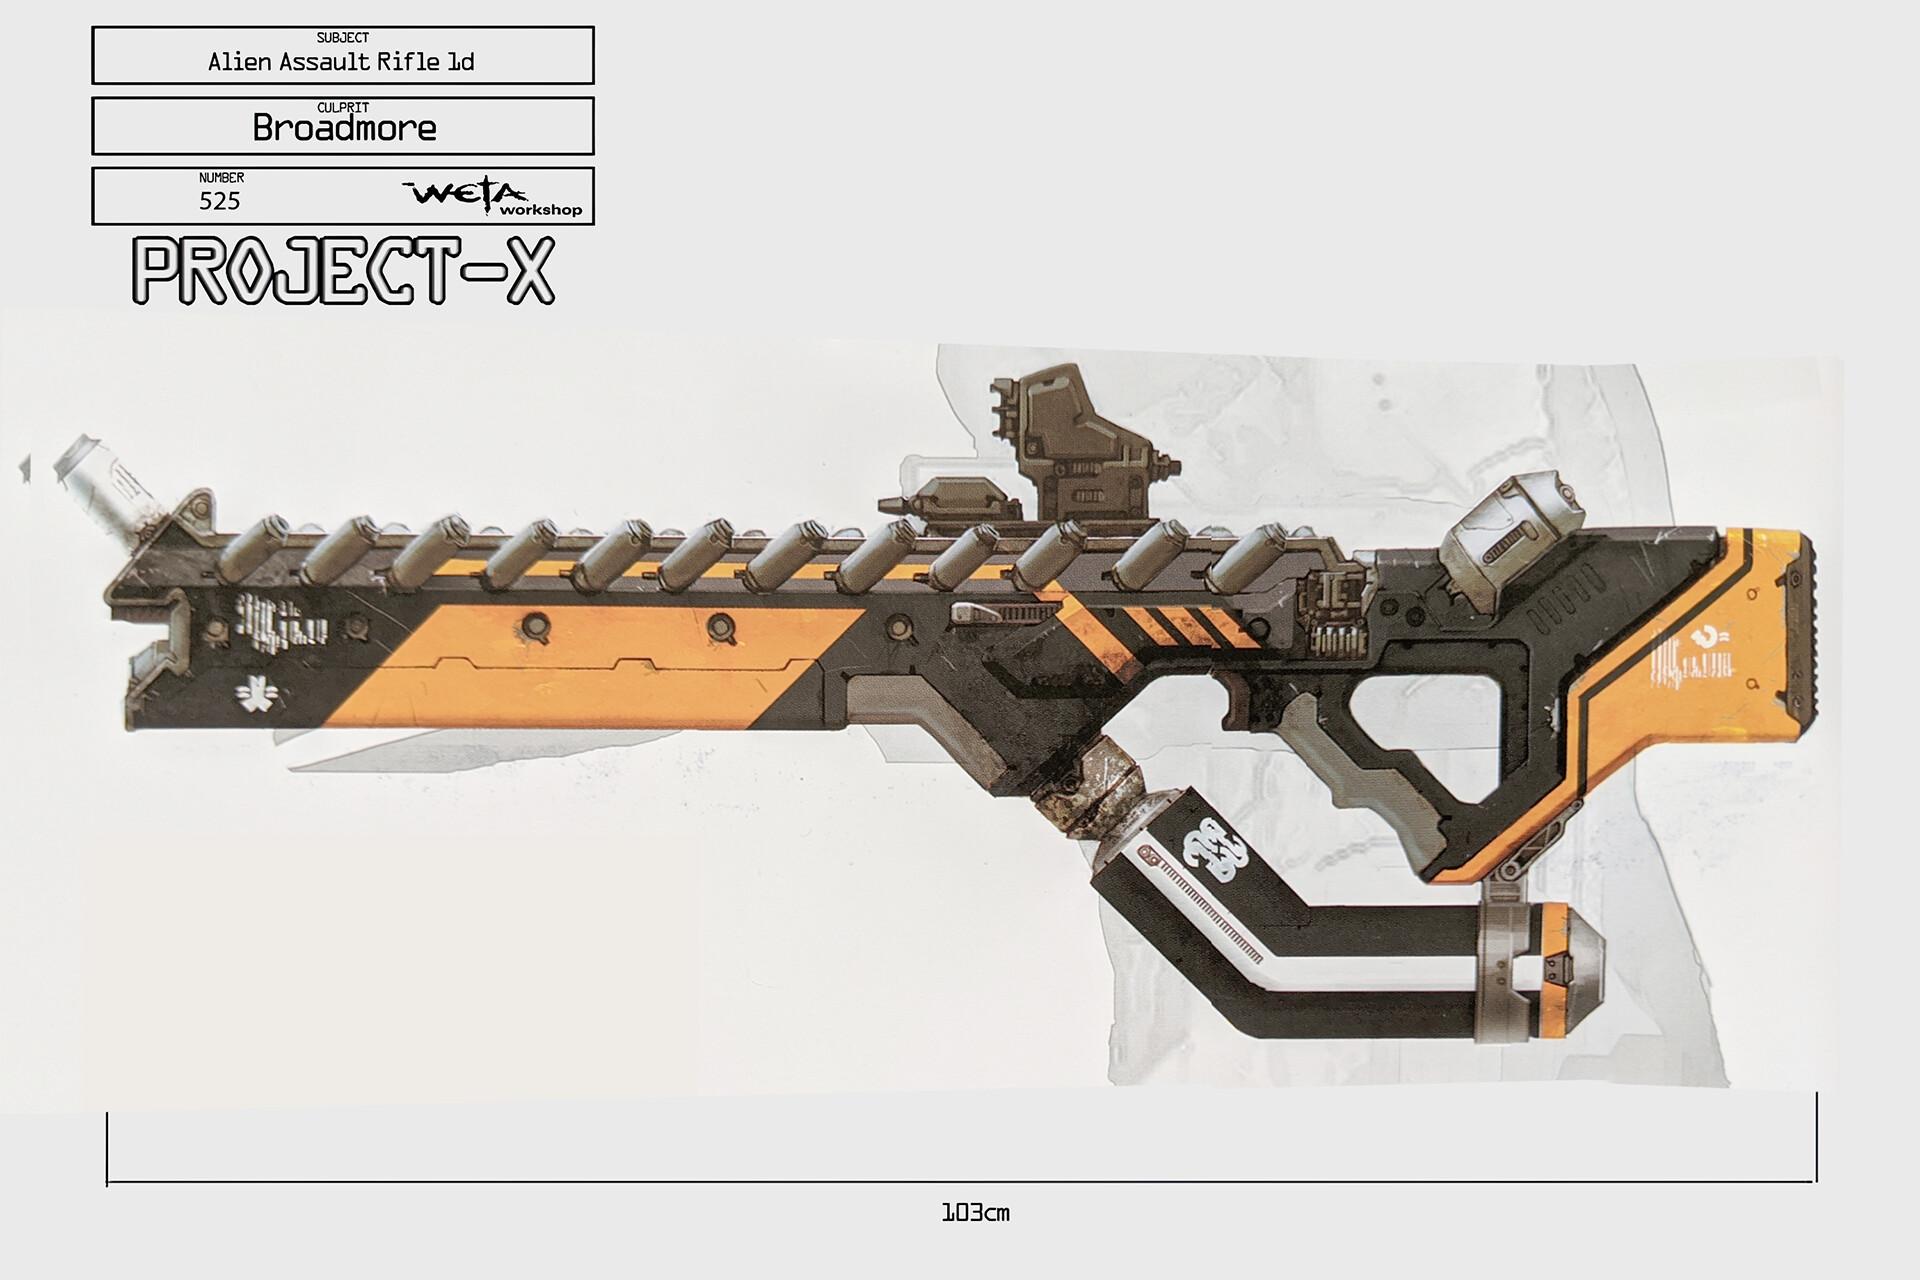 Weta Workshop Concept by Greg Broadmore